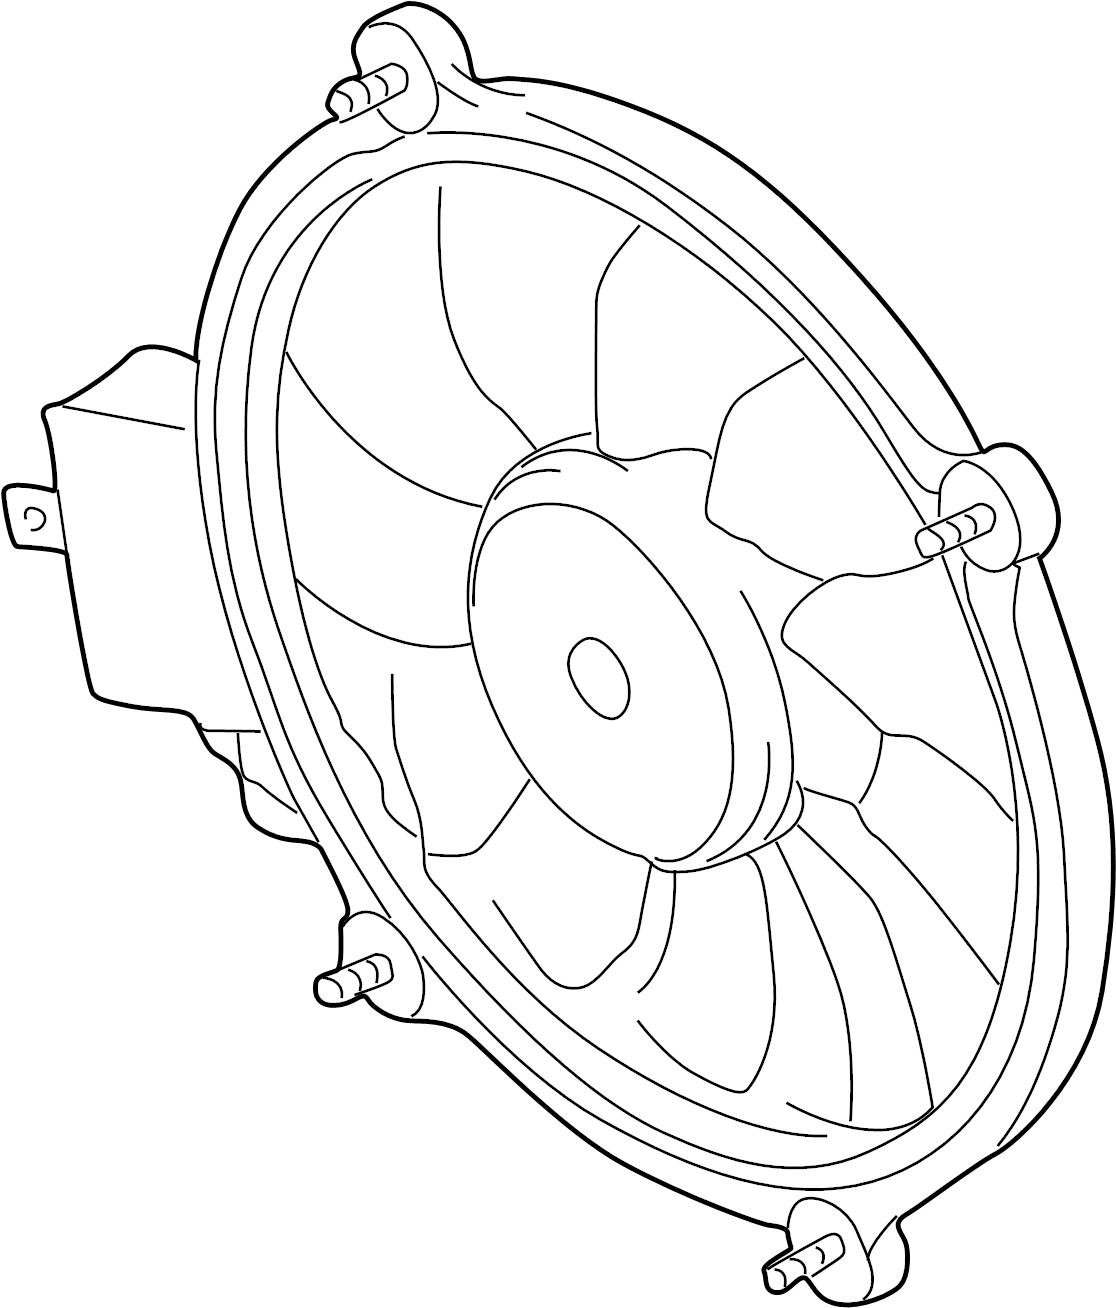 2002 Volkswagen Passat Wagon Electric. Fan and motor